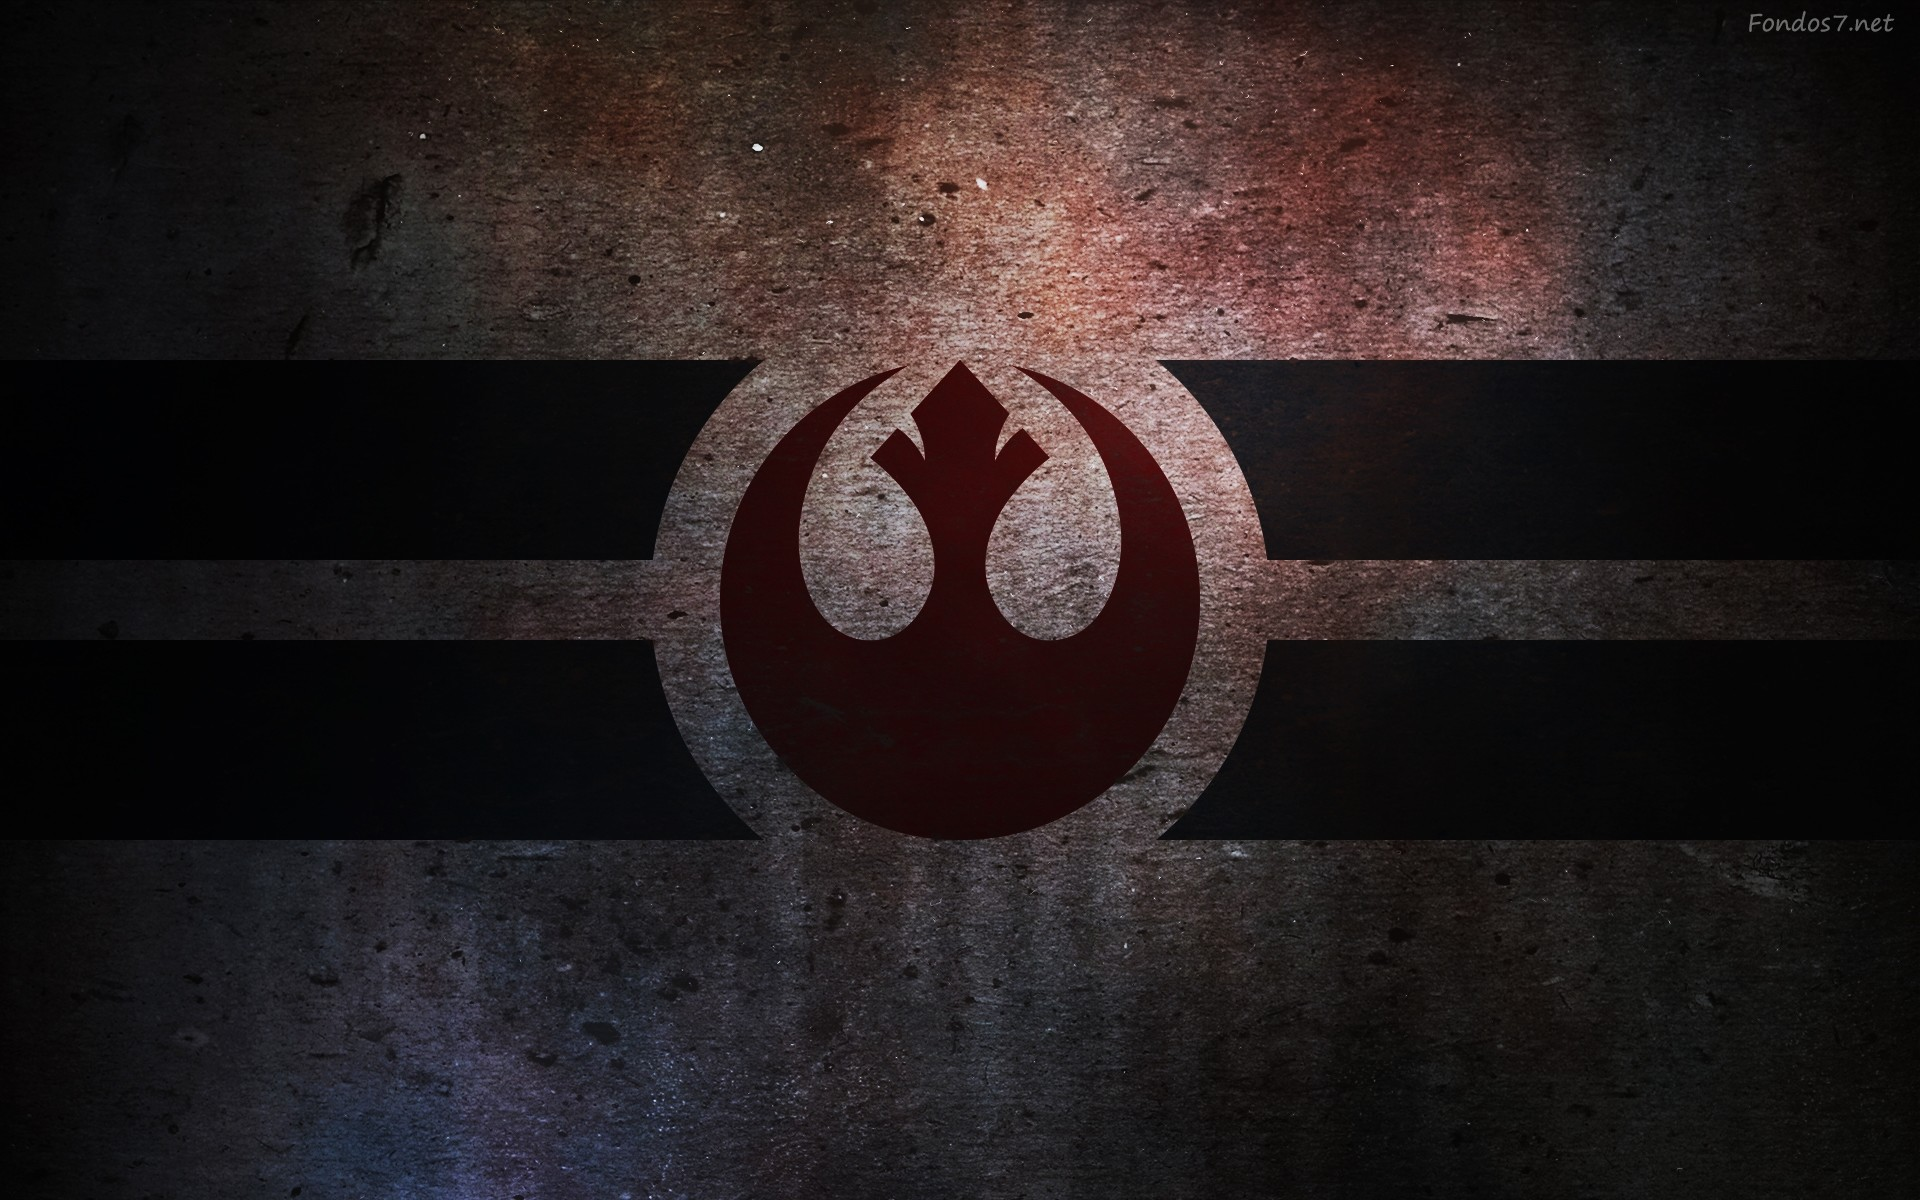 star wars logo wallpaper widescreen wallpapers original .